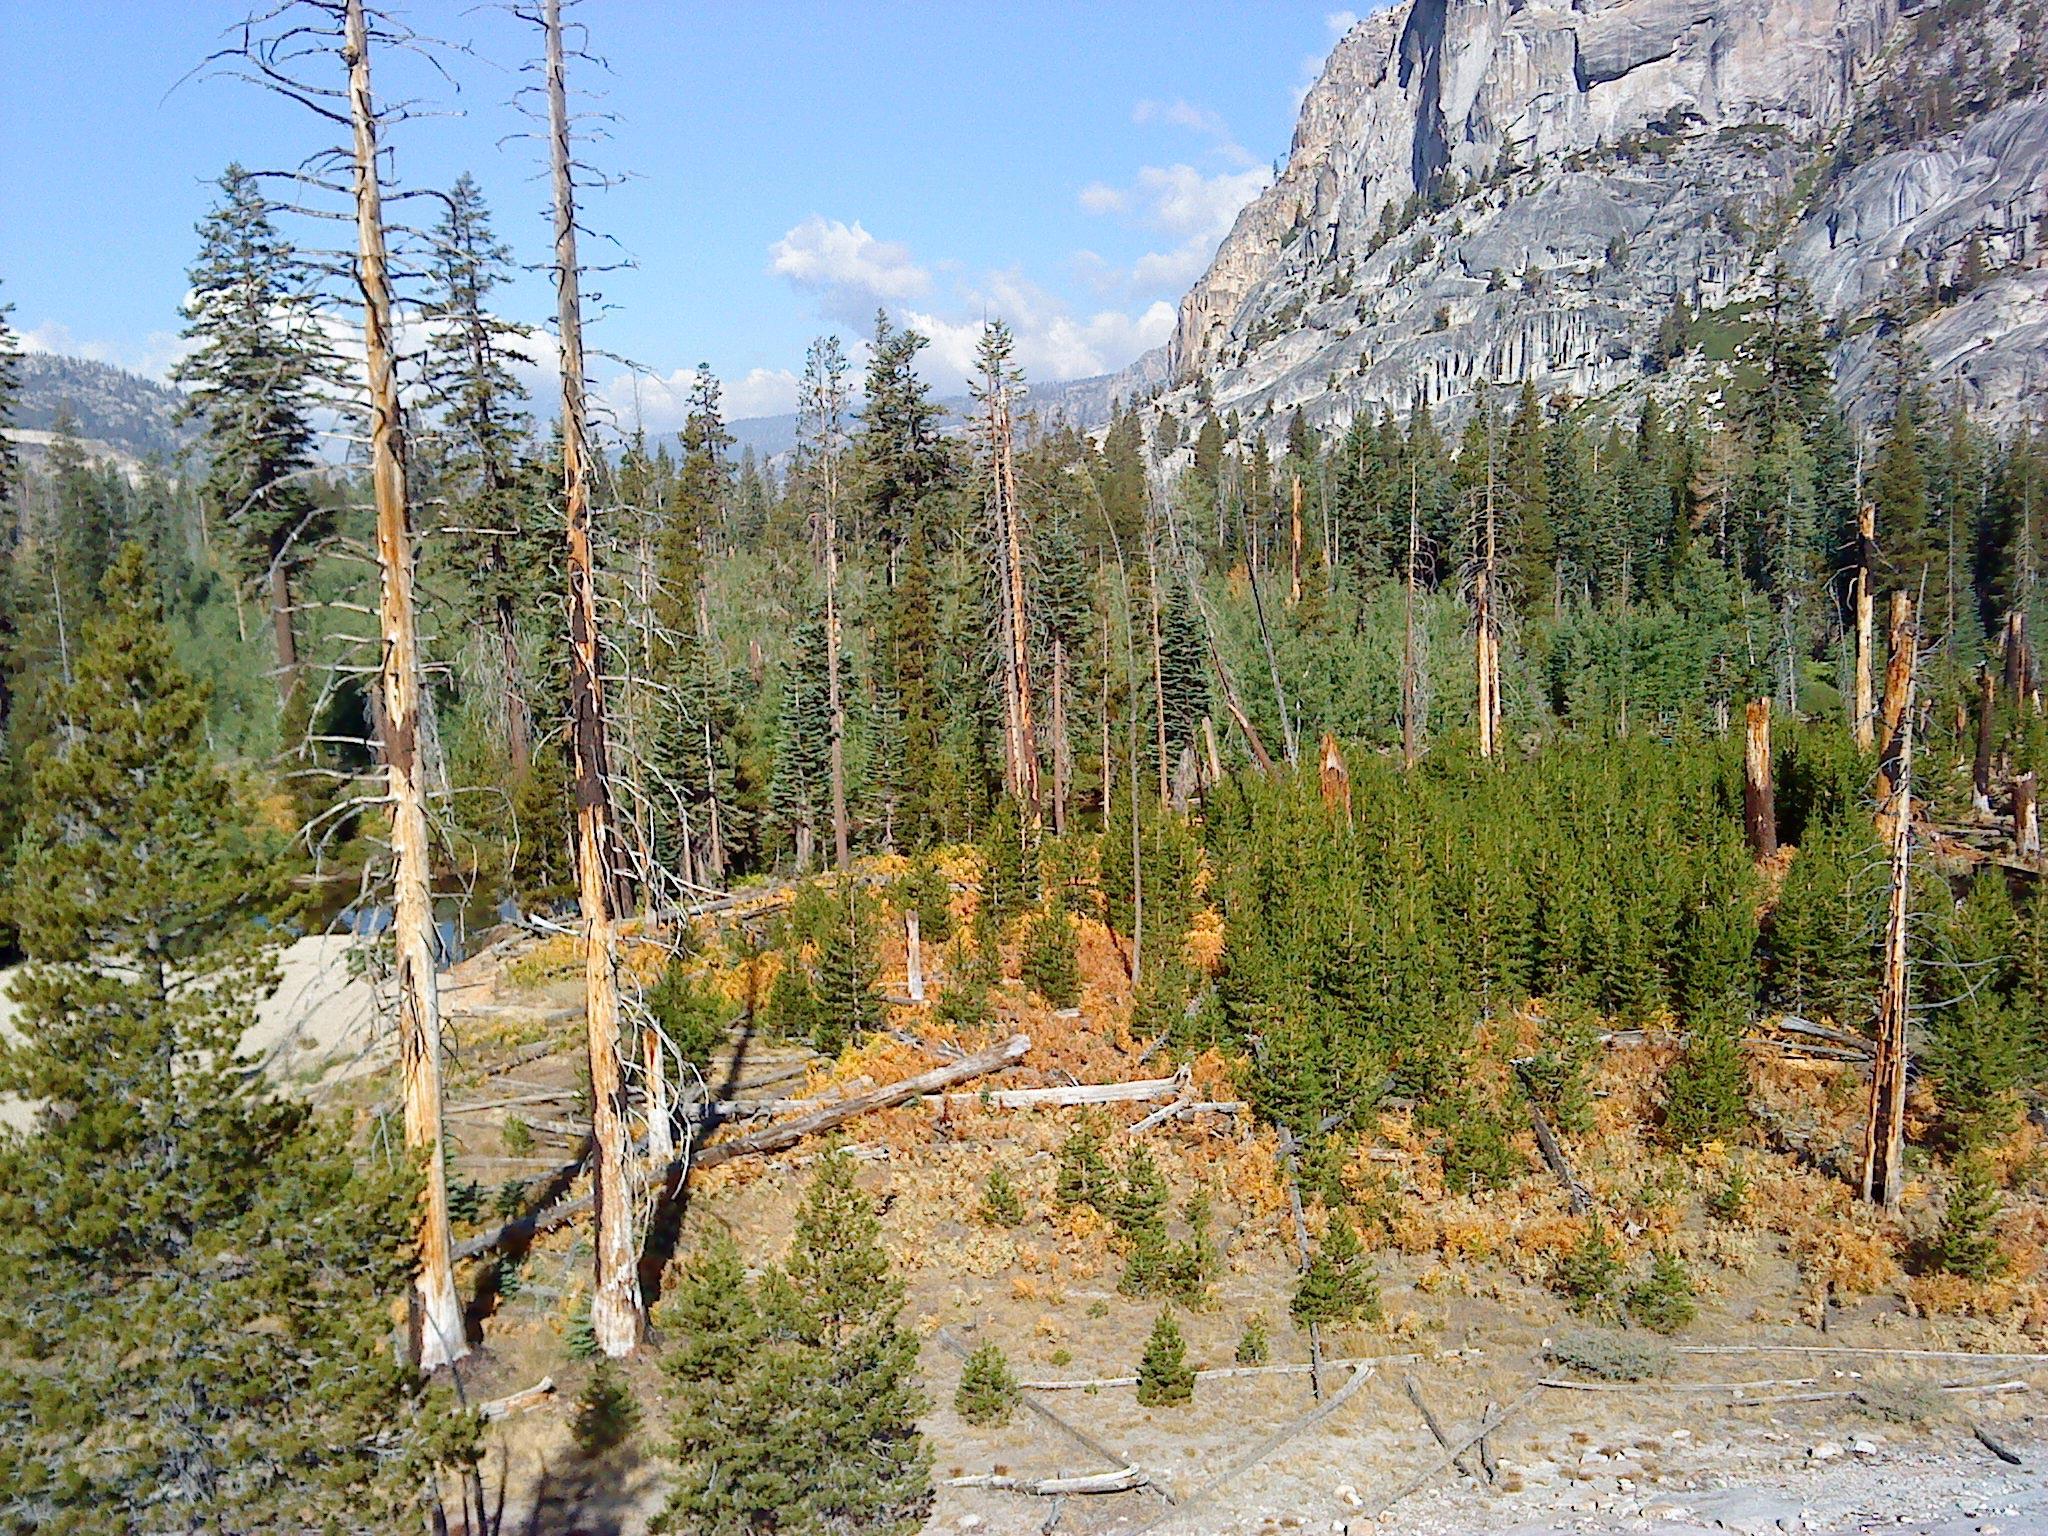 Pine Trees Tuolumne Valley of Yosemite National Park